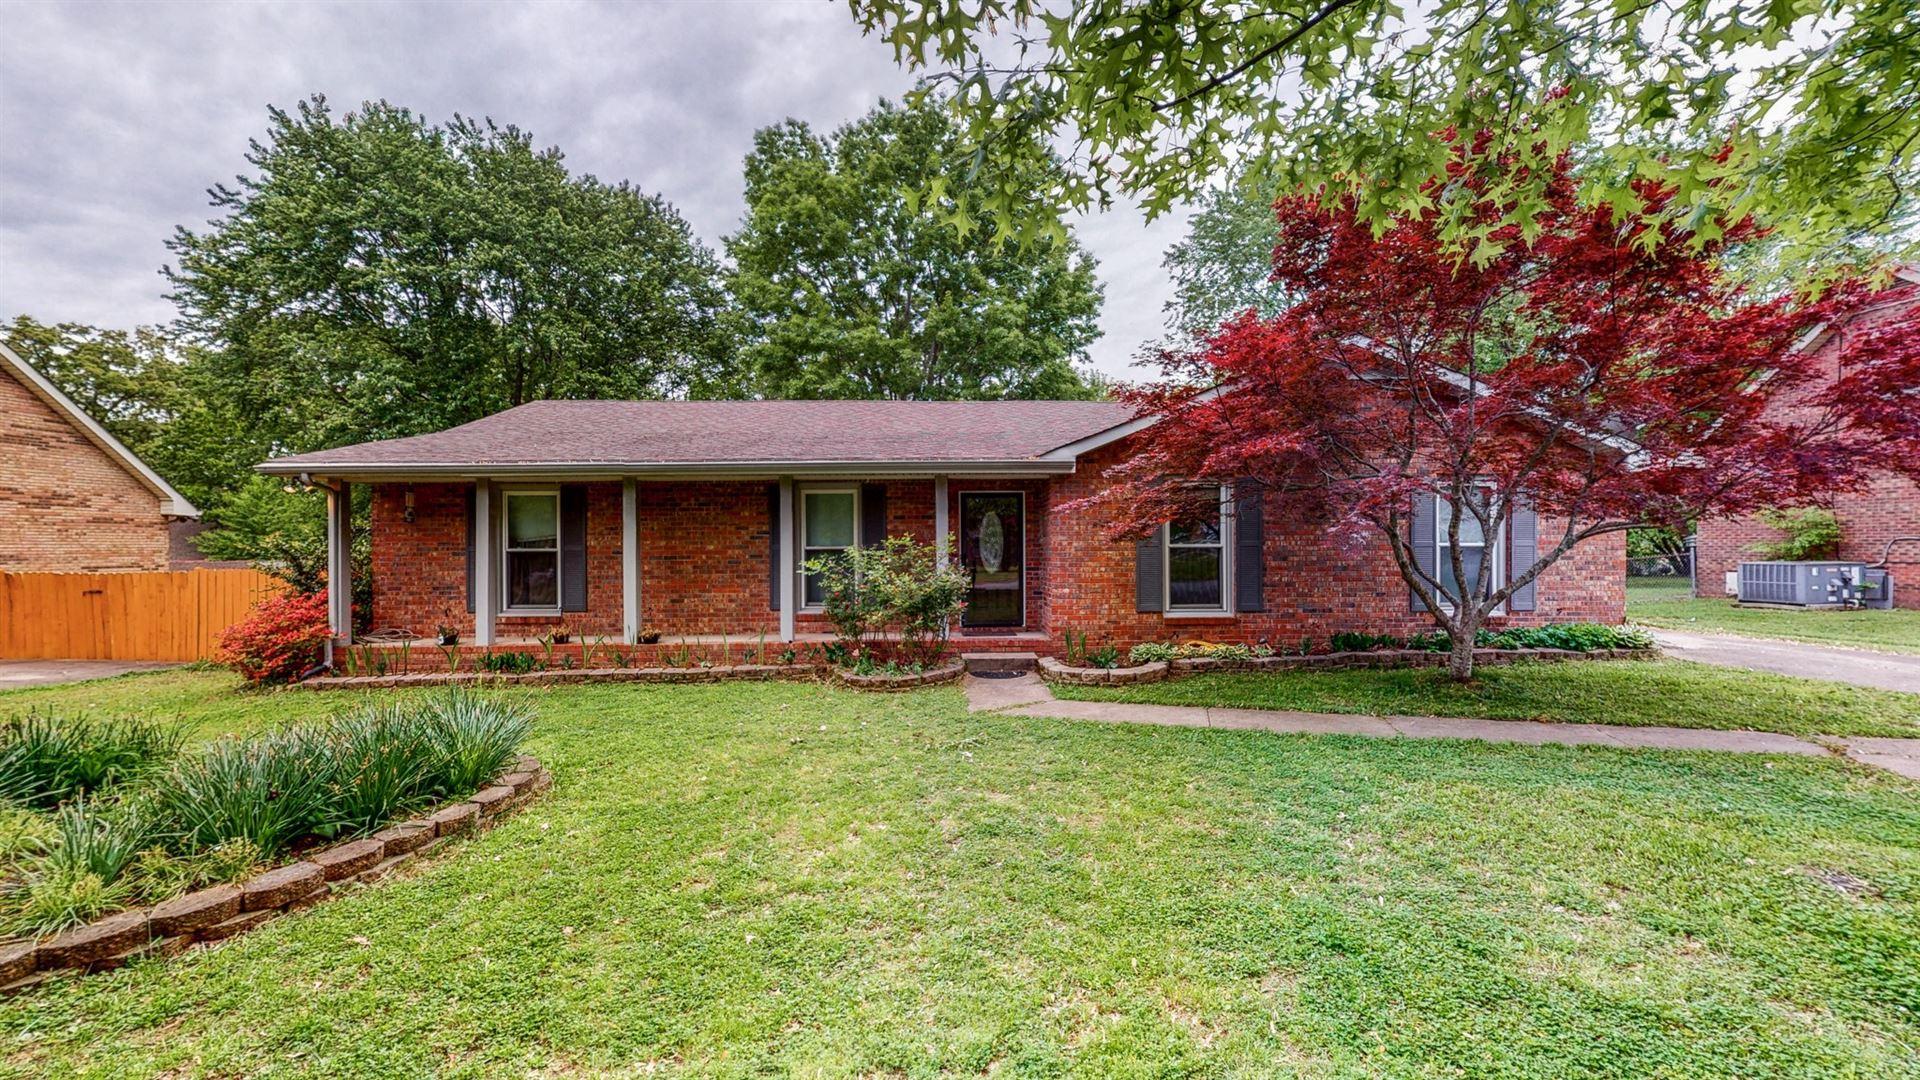 1187 Woodbridge Dr, Clarksville, TN 37042 - MLS#: 2250023